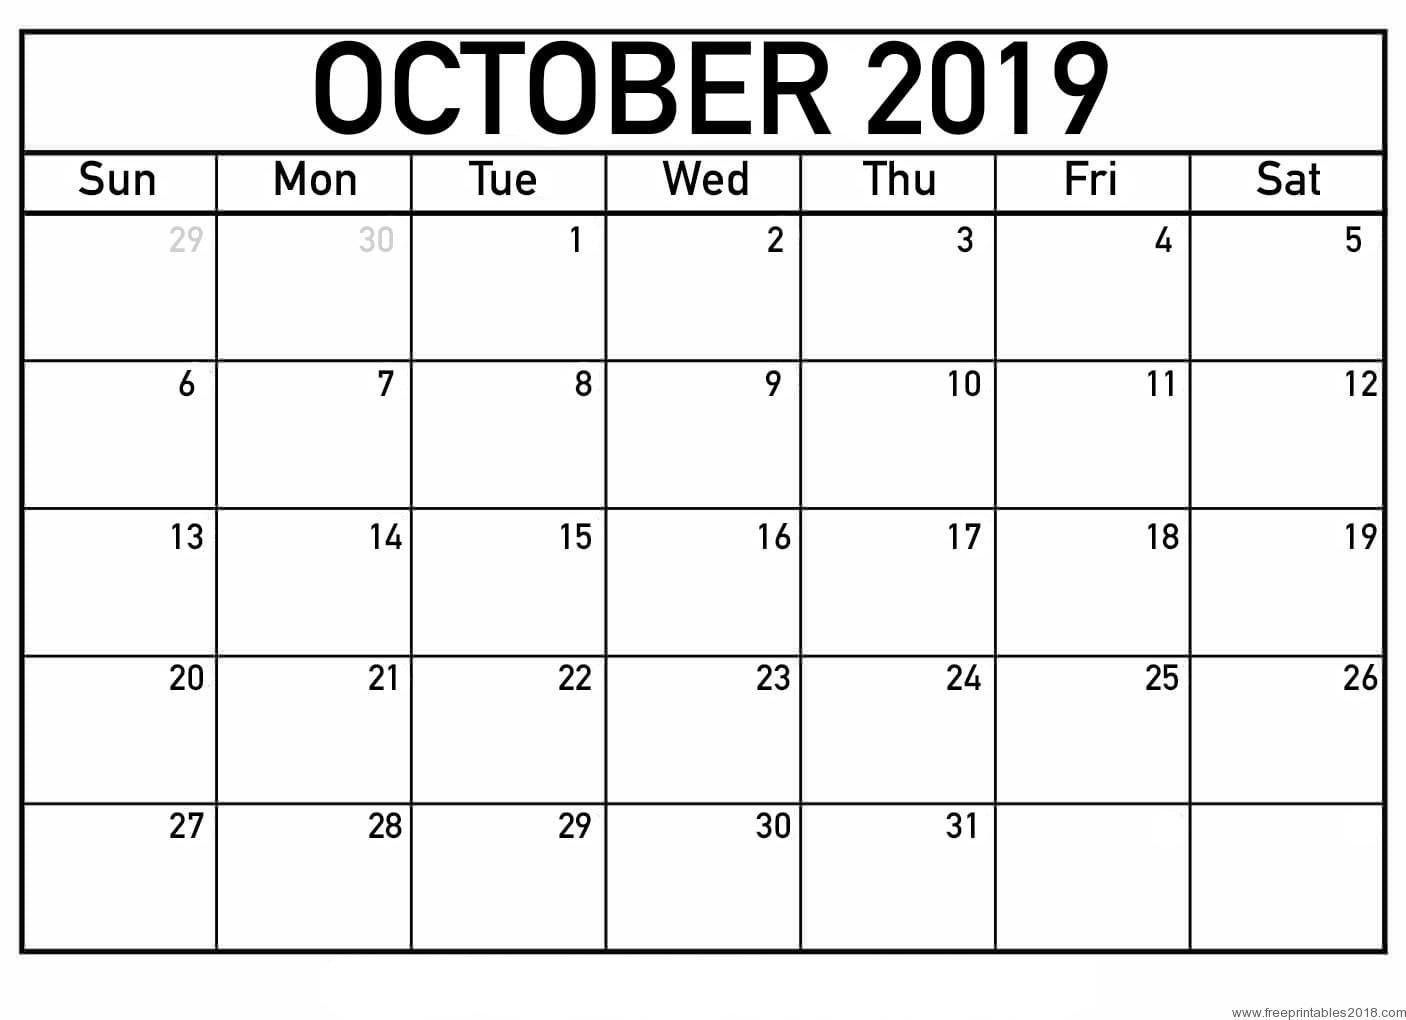 October Calendar 2019 Printable Template – Pdf, Word, Excel